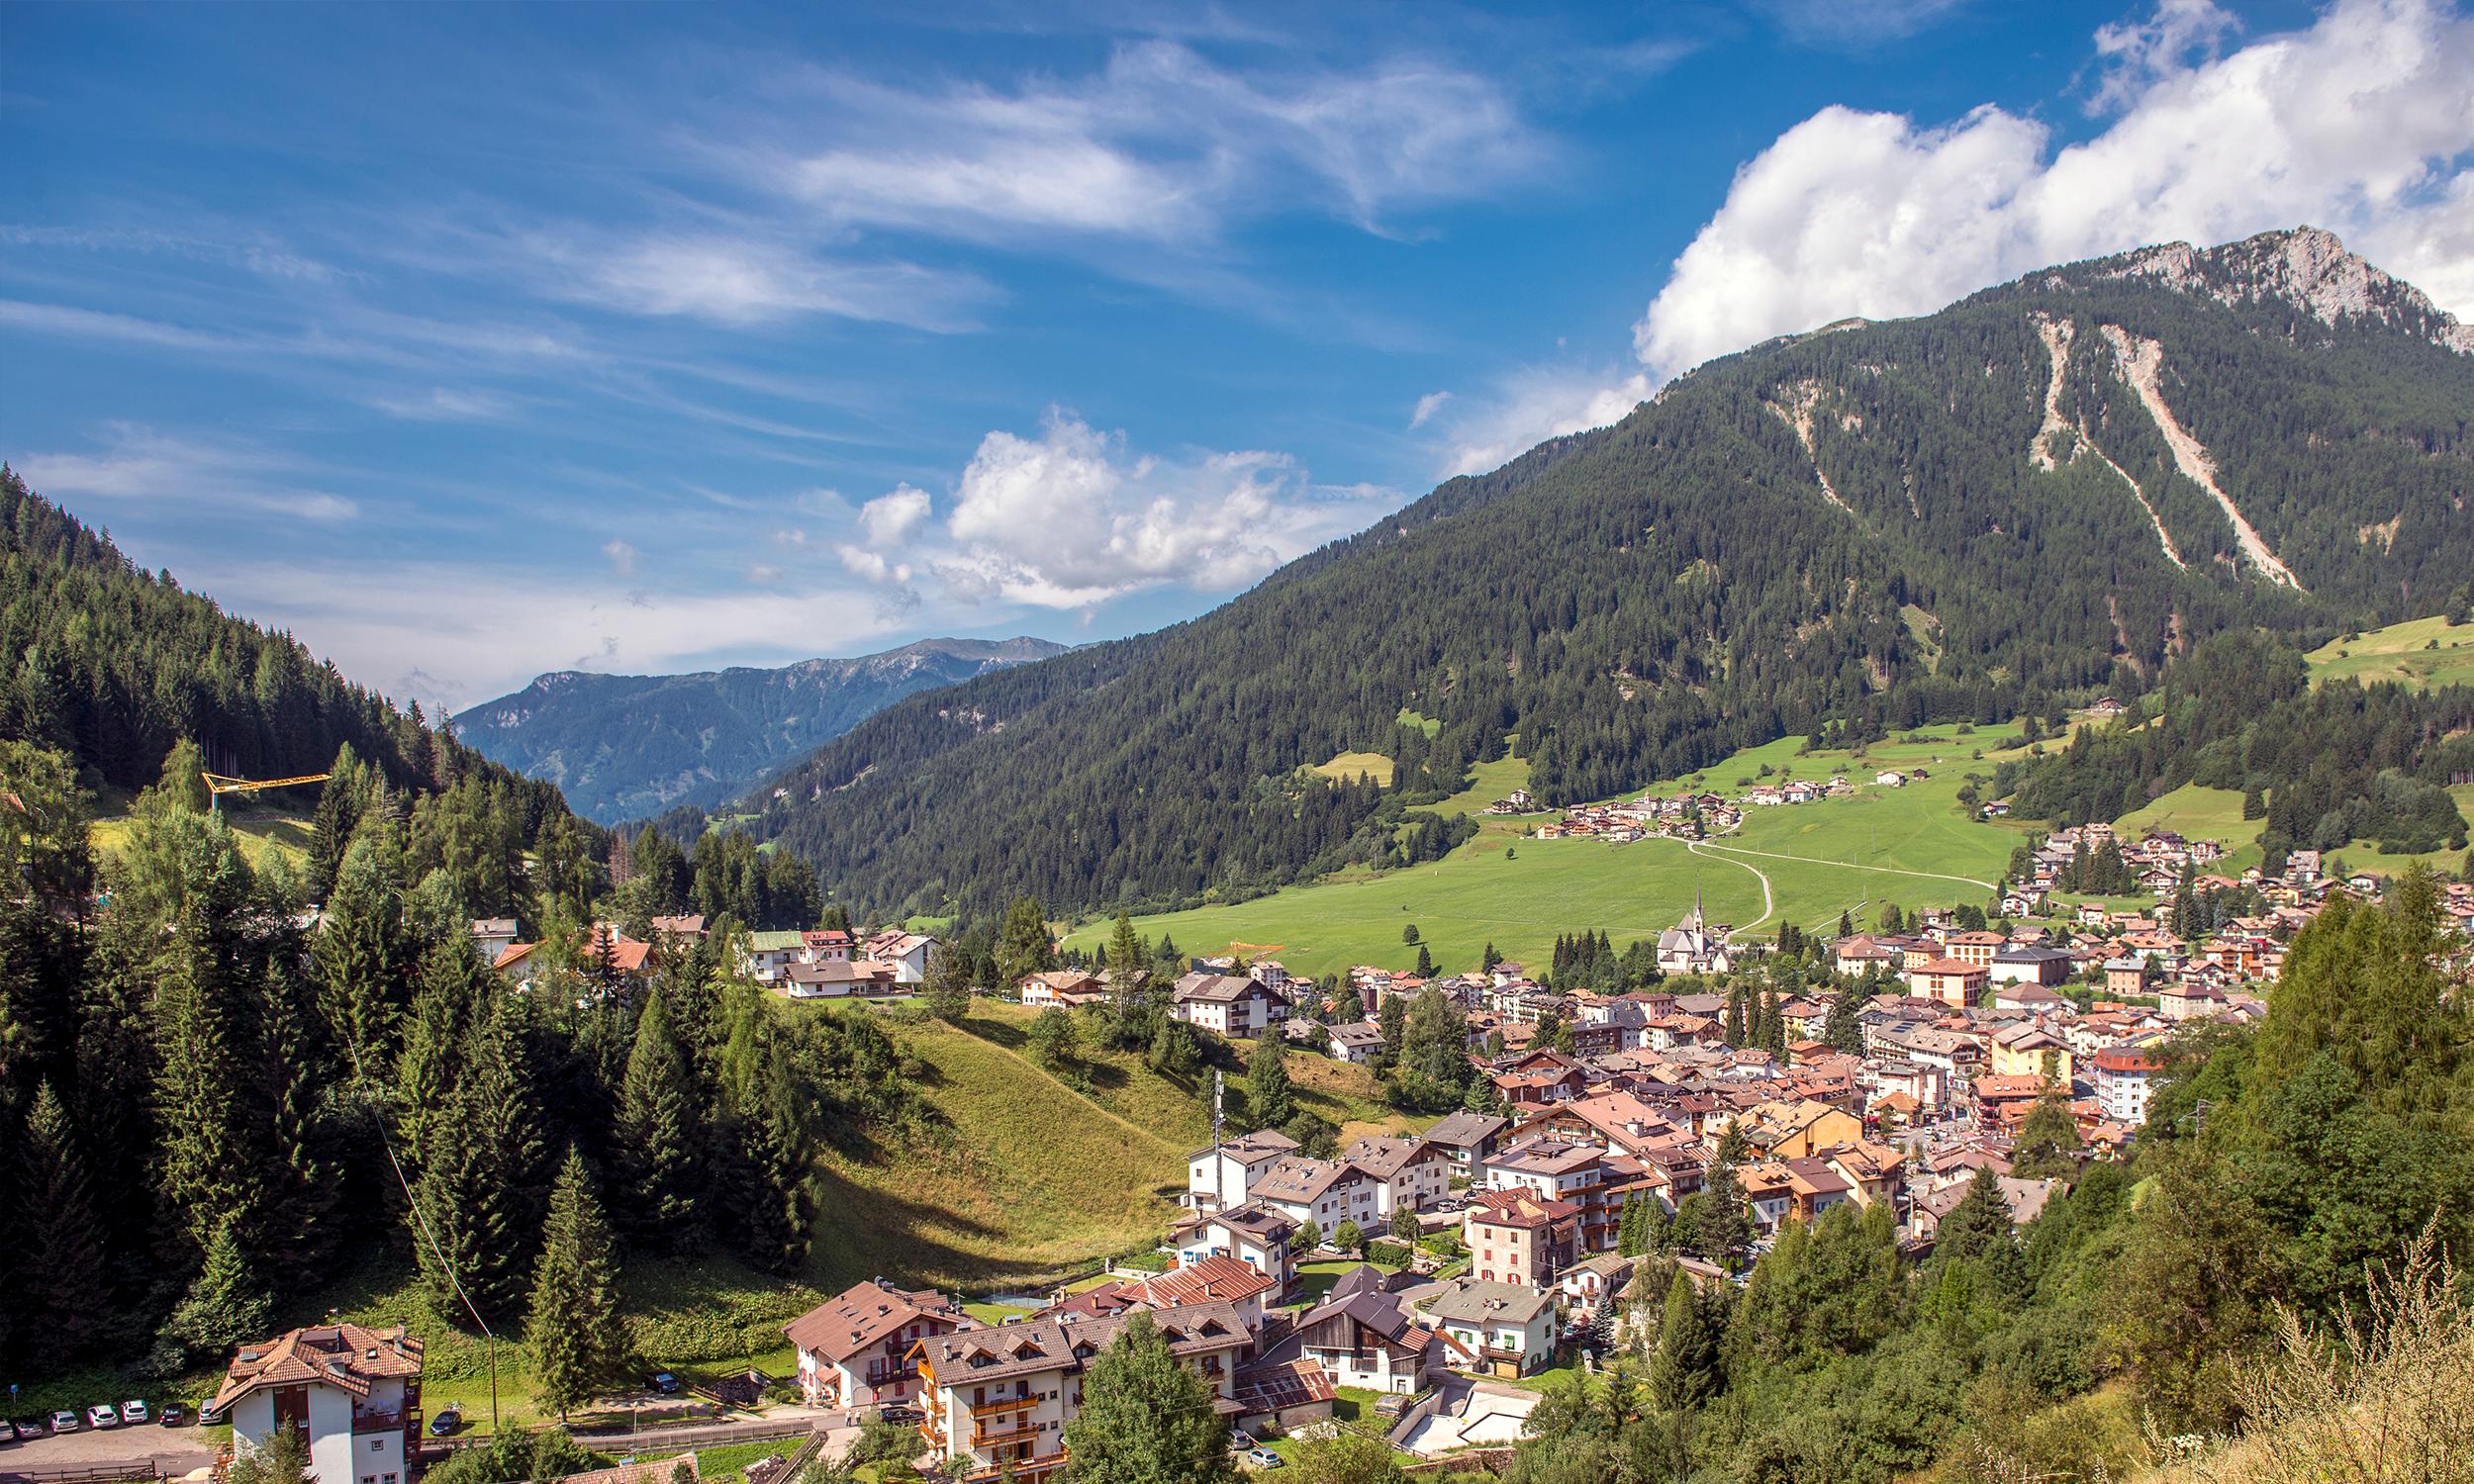 Vacanze Estate 2016 Scegli Moena in Val di Fassa